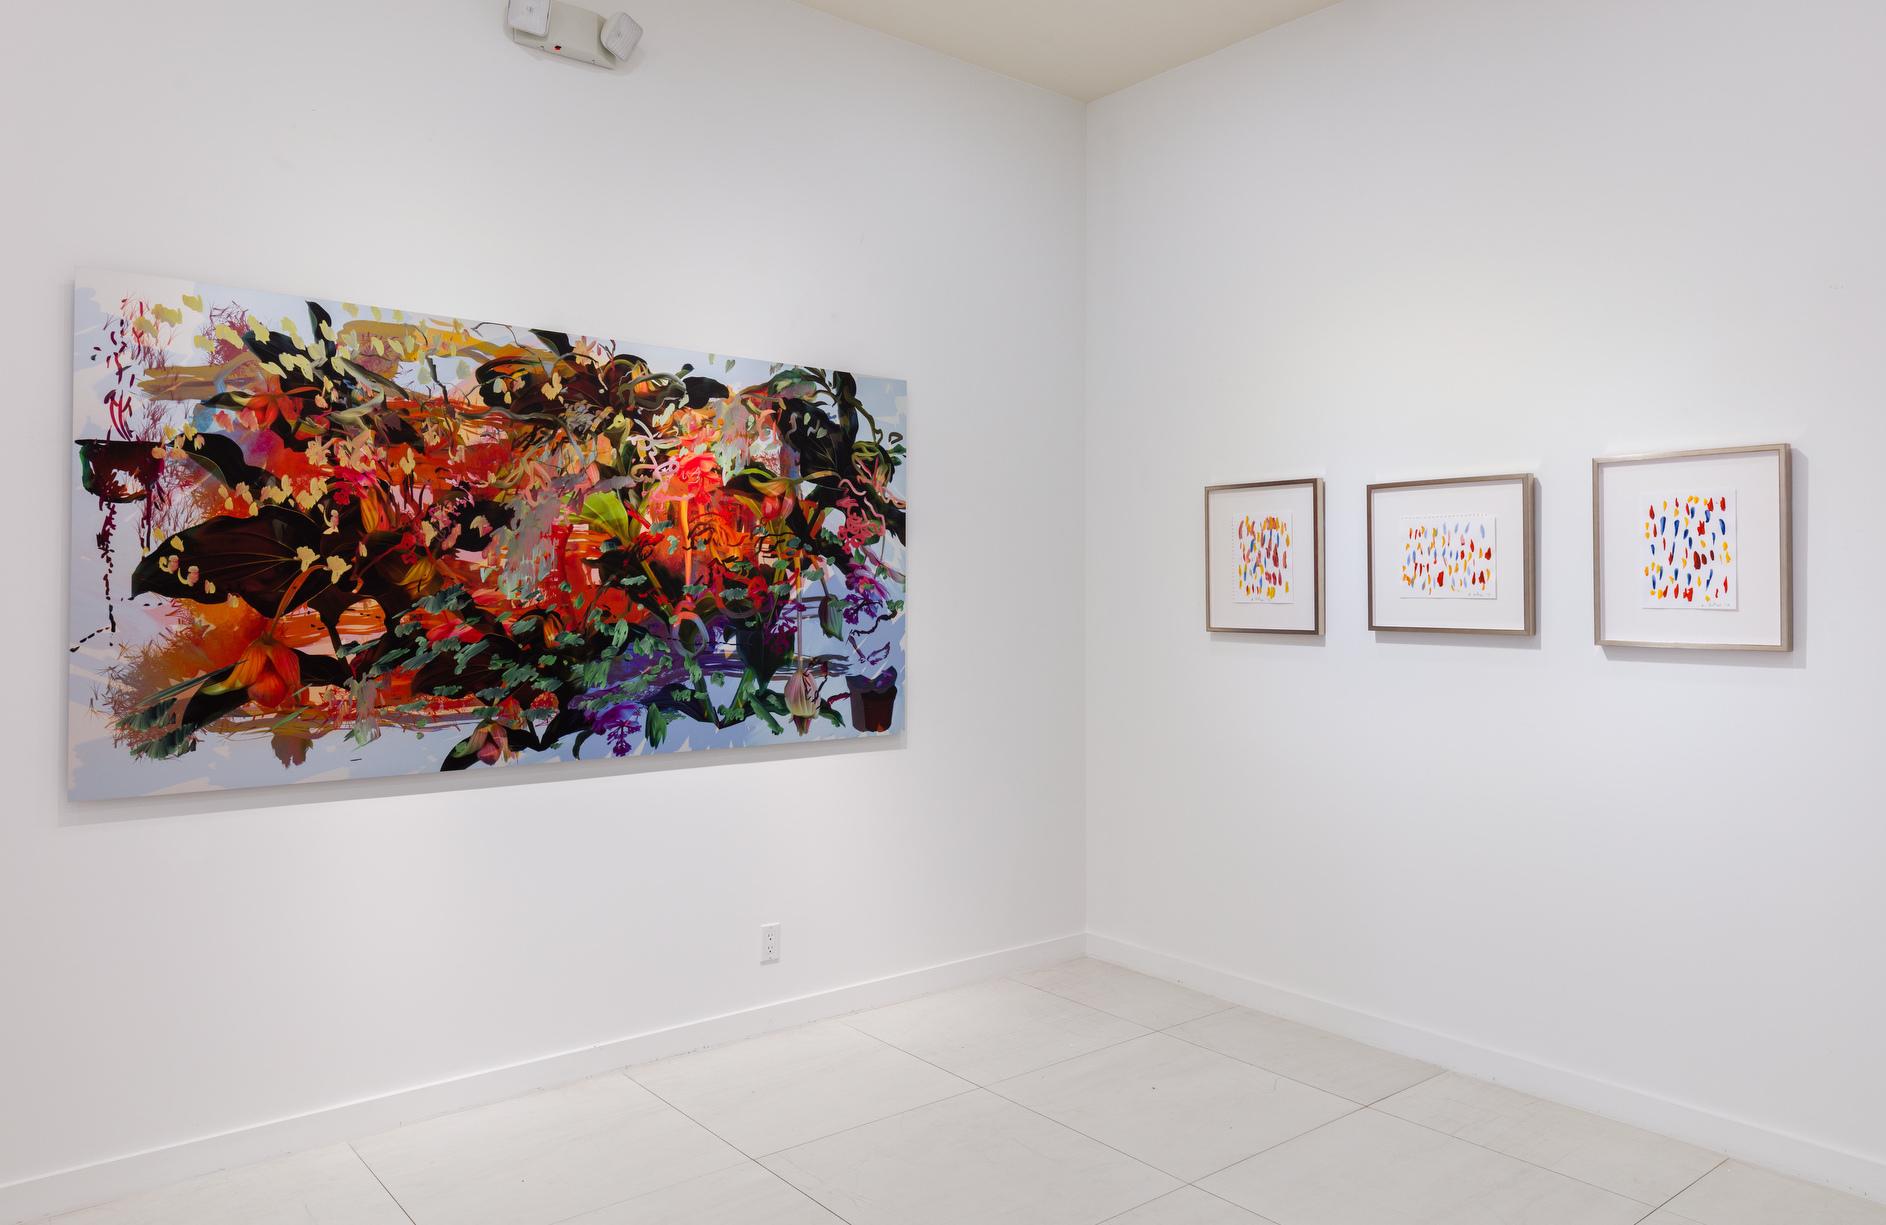 011 Brintz Gallery.JPG